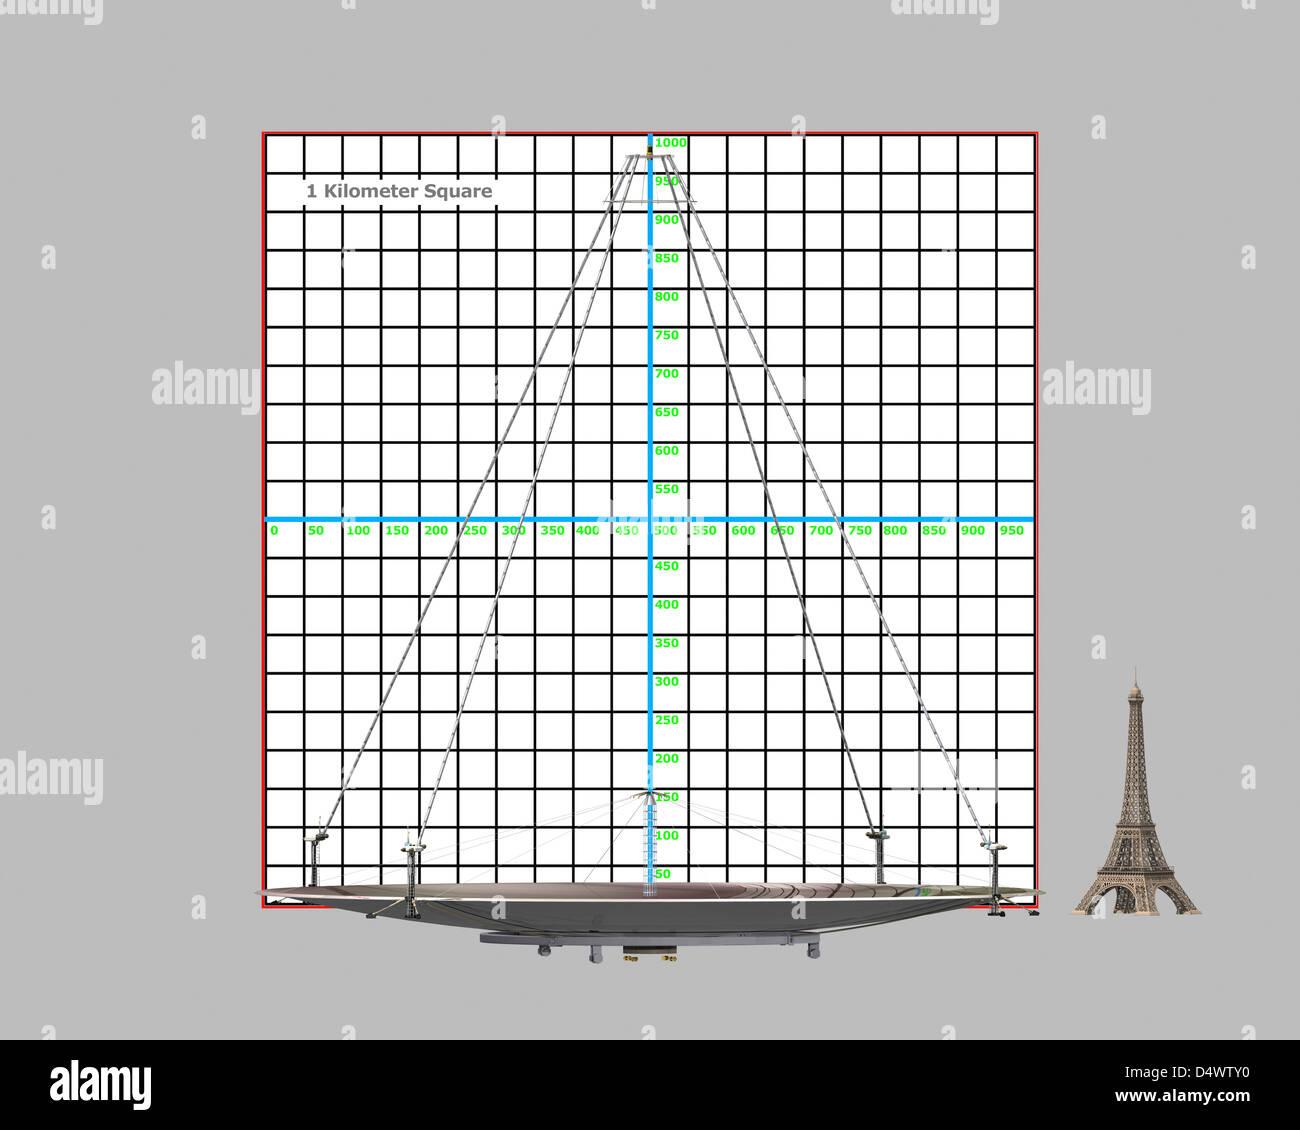 Lunar liquid mirror telescope scale reference - Stock Image